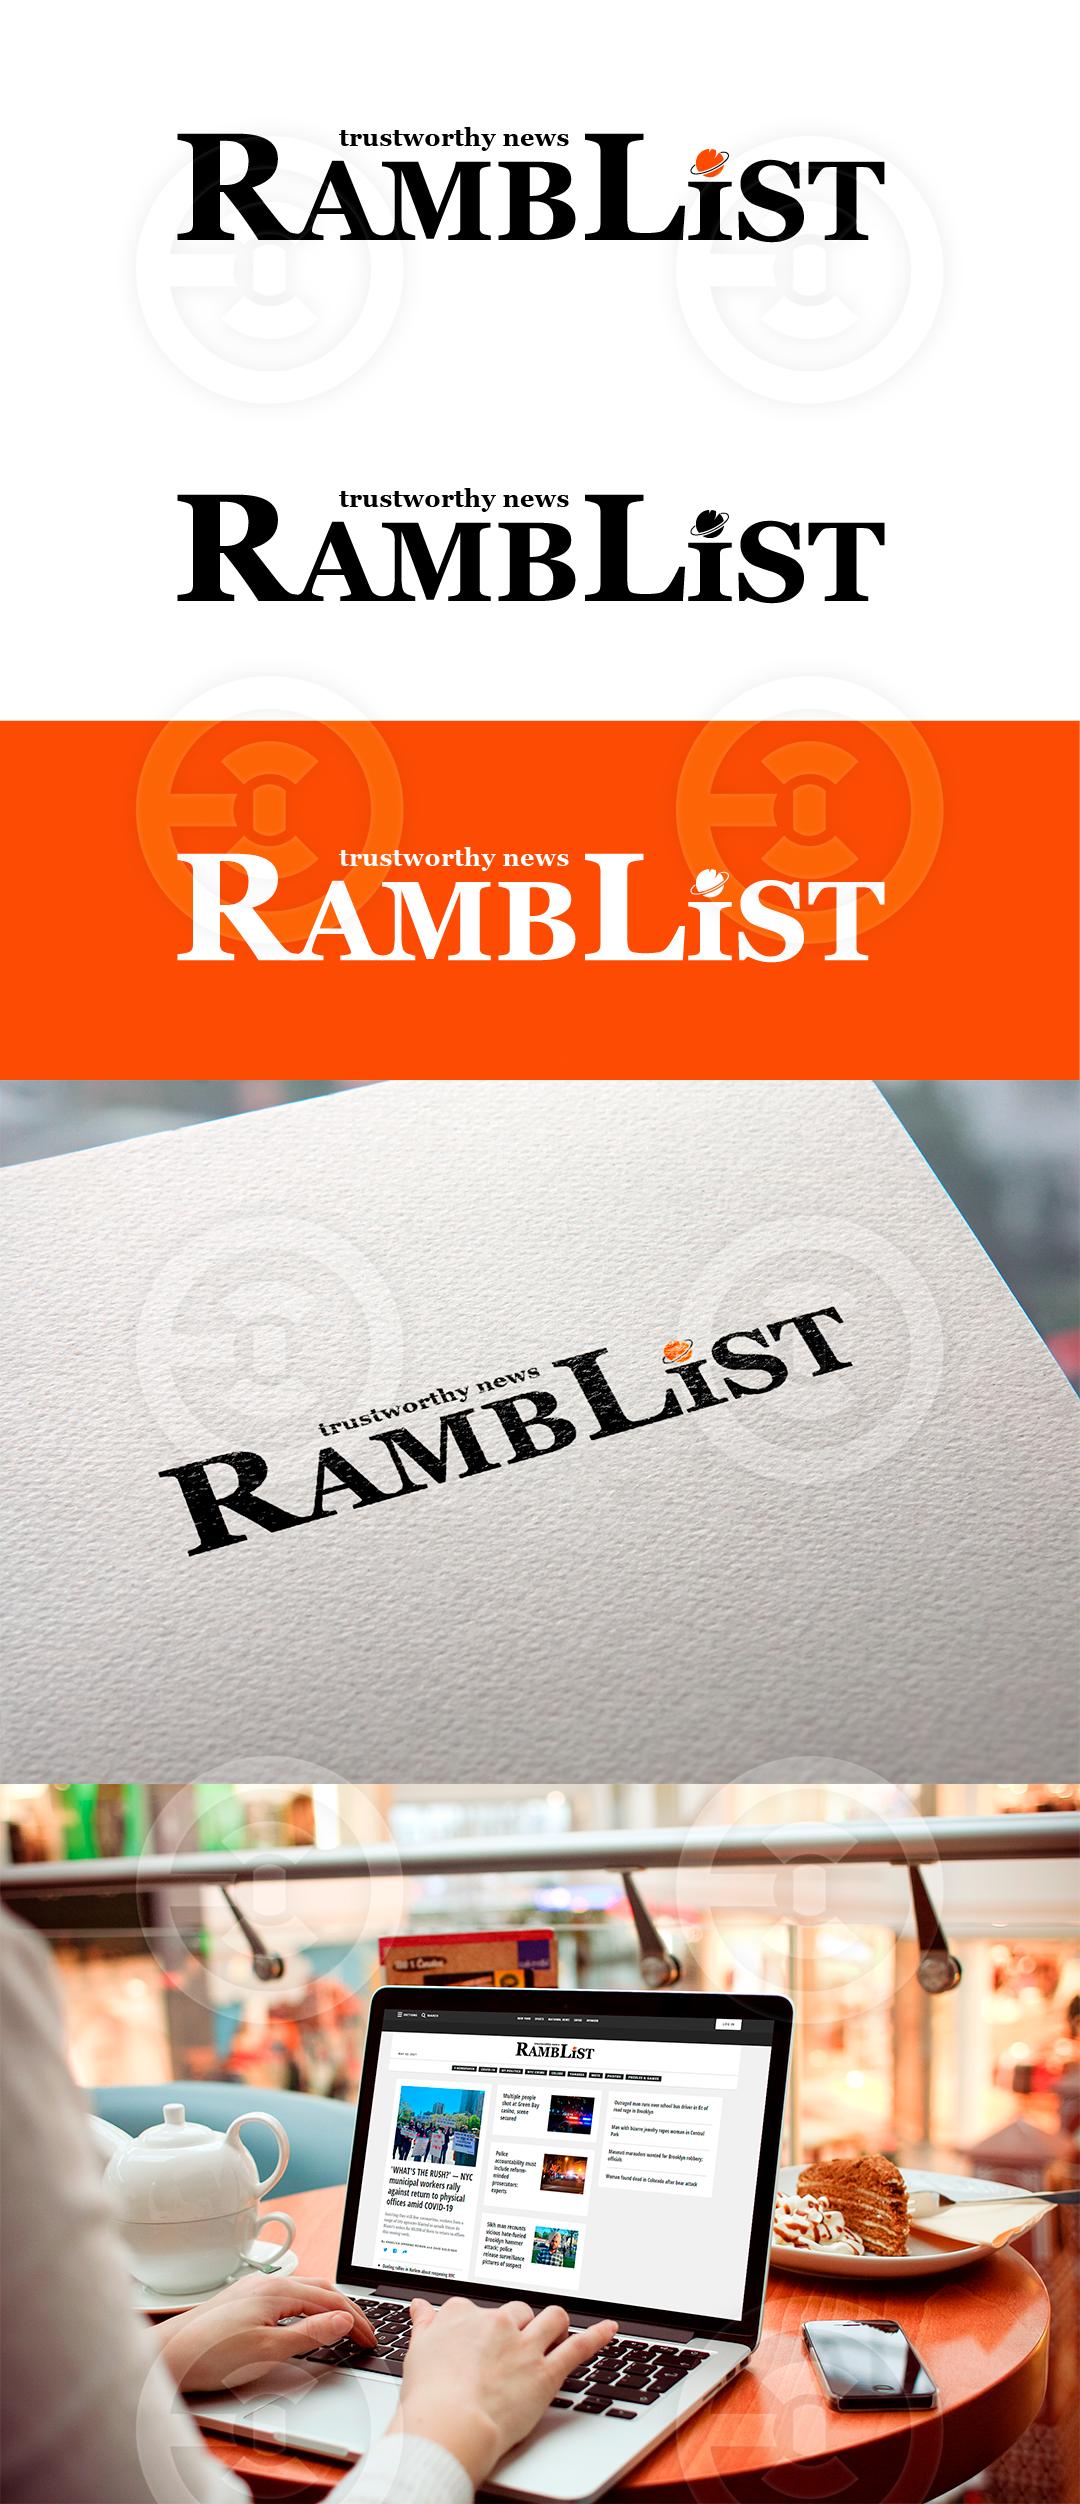 ramblist2.png